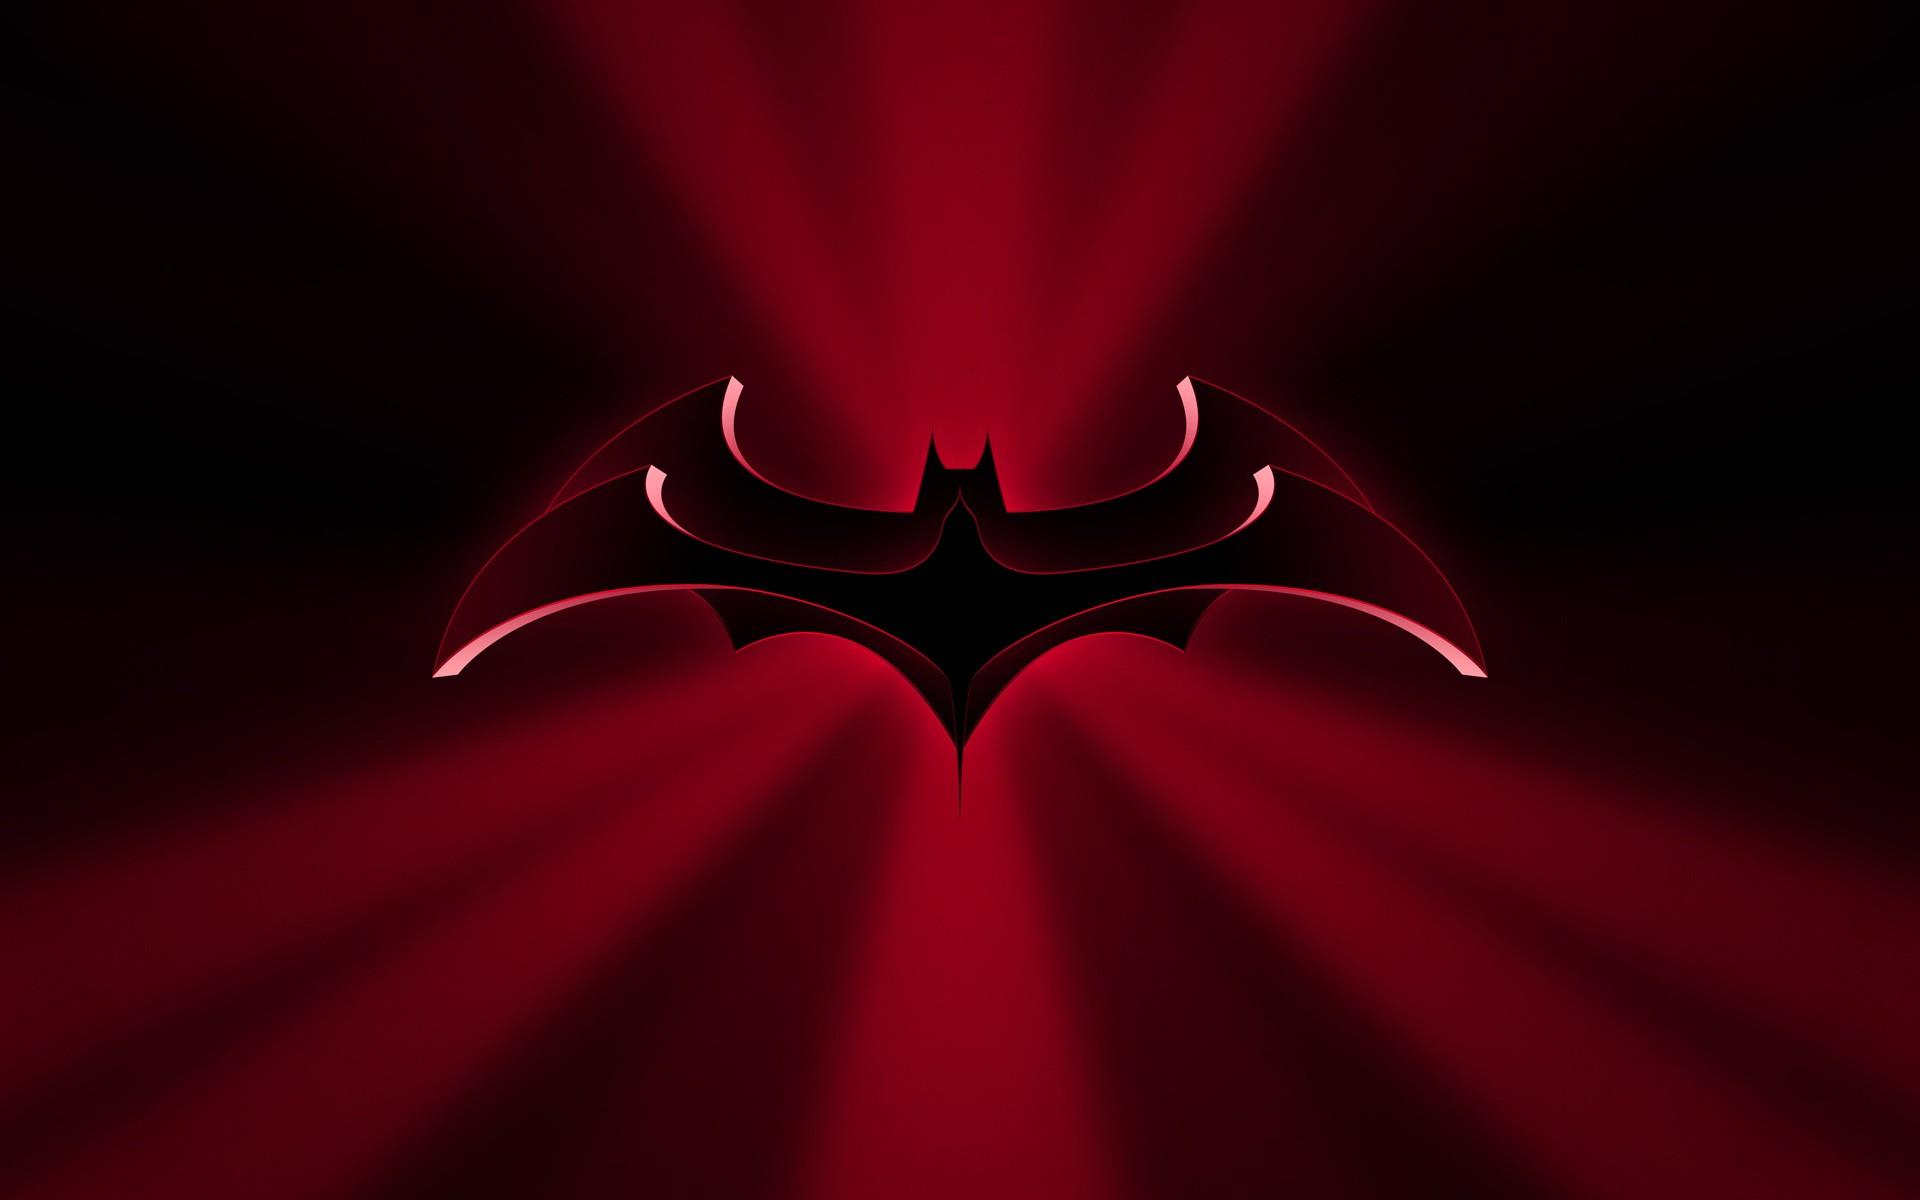 Batman Hd Wallpaper Background Image 1920x1200 Id